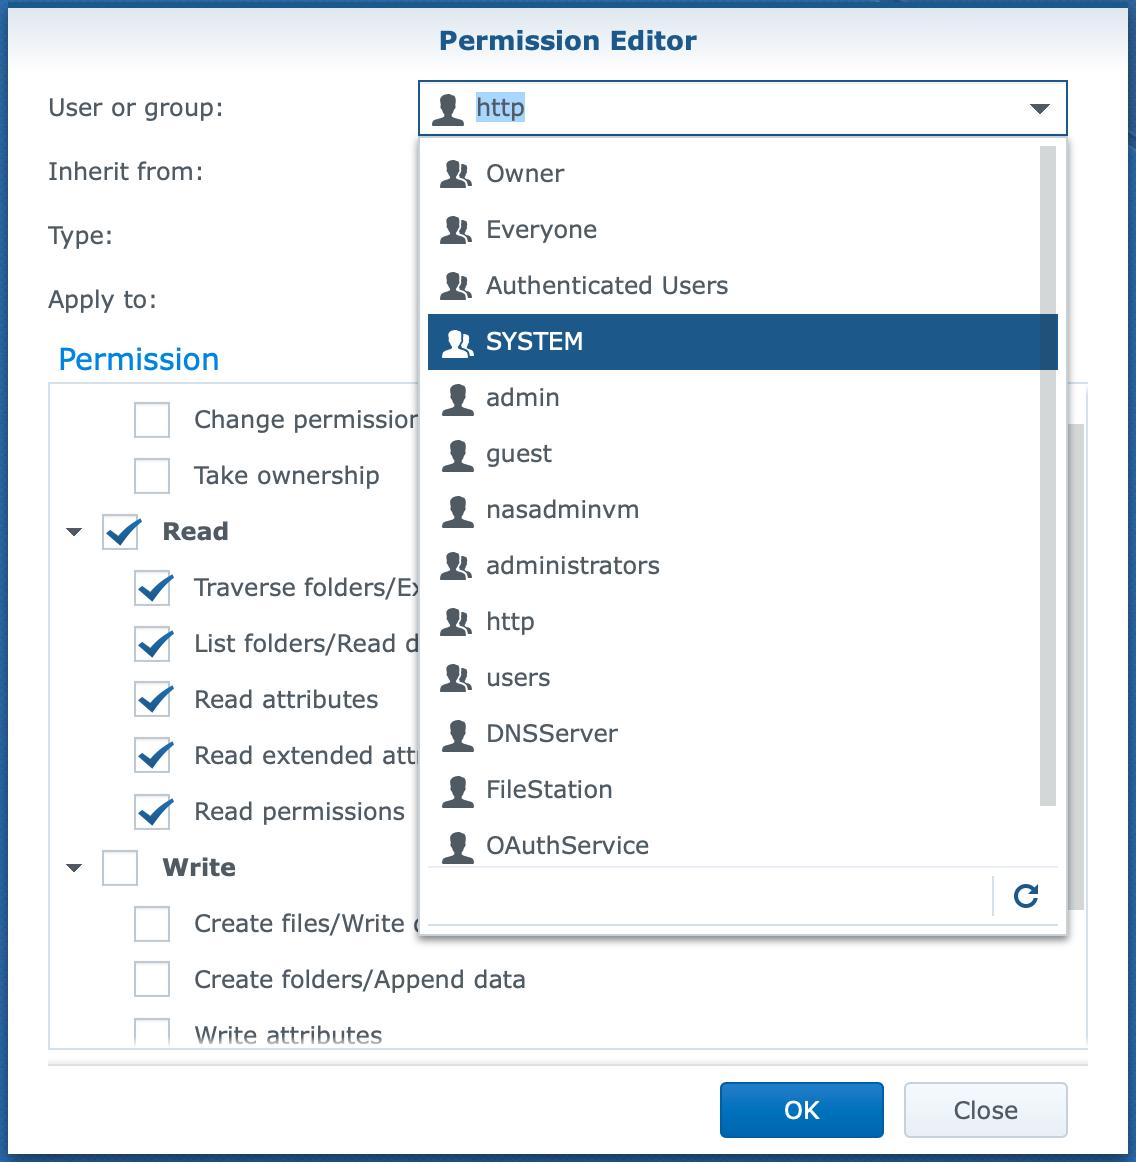 synology, file station, permission editor